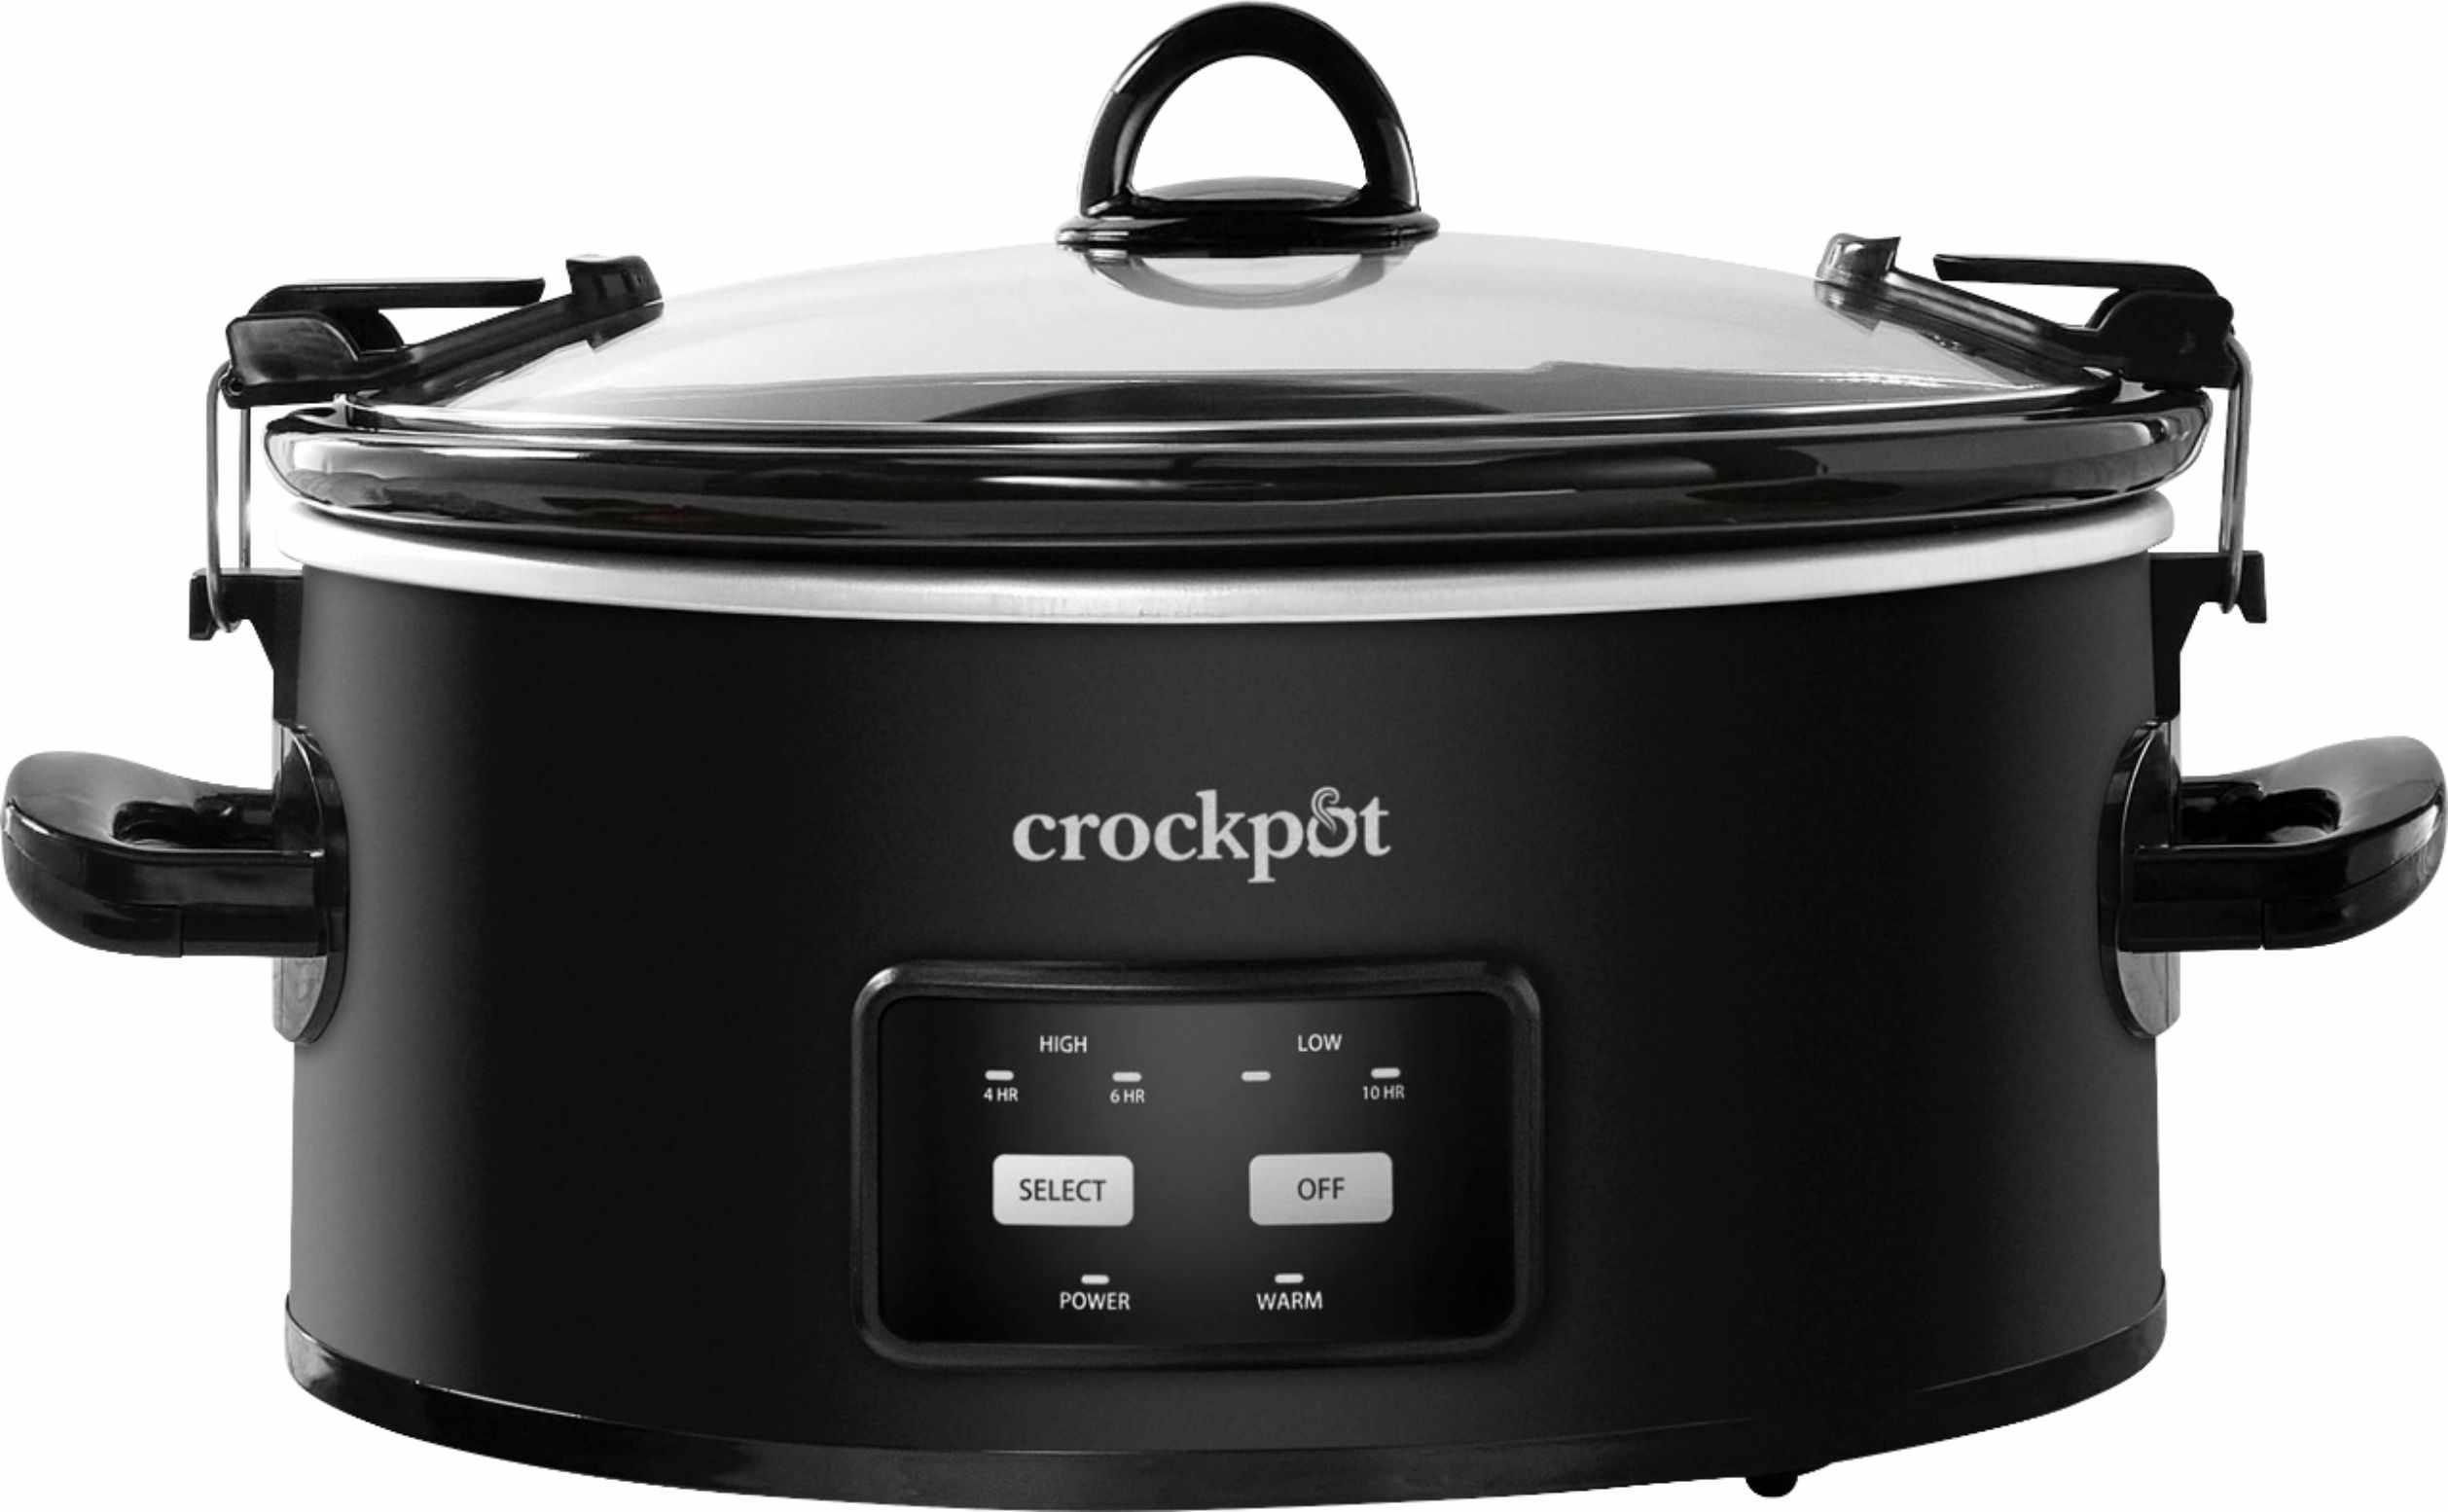 Crock-Pot 6 Quart Programmable Cook & Carry Slow Cooker